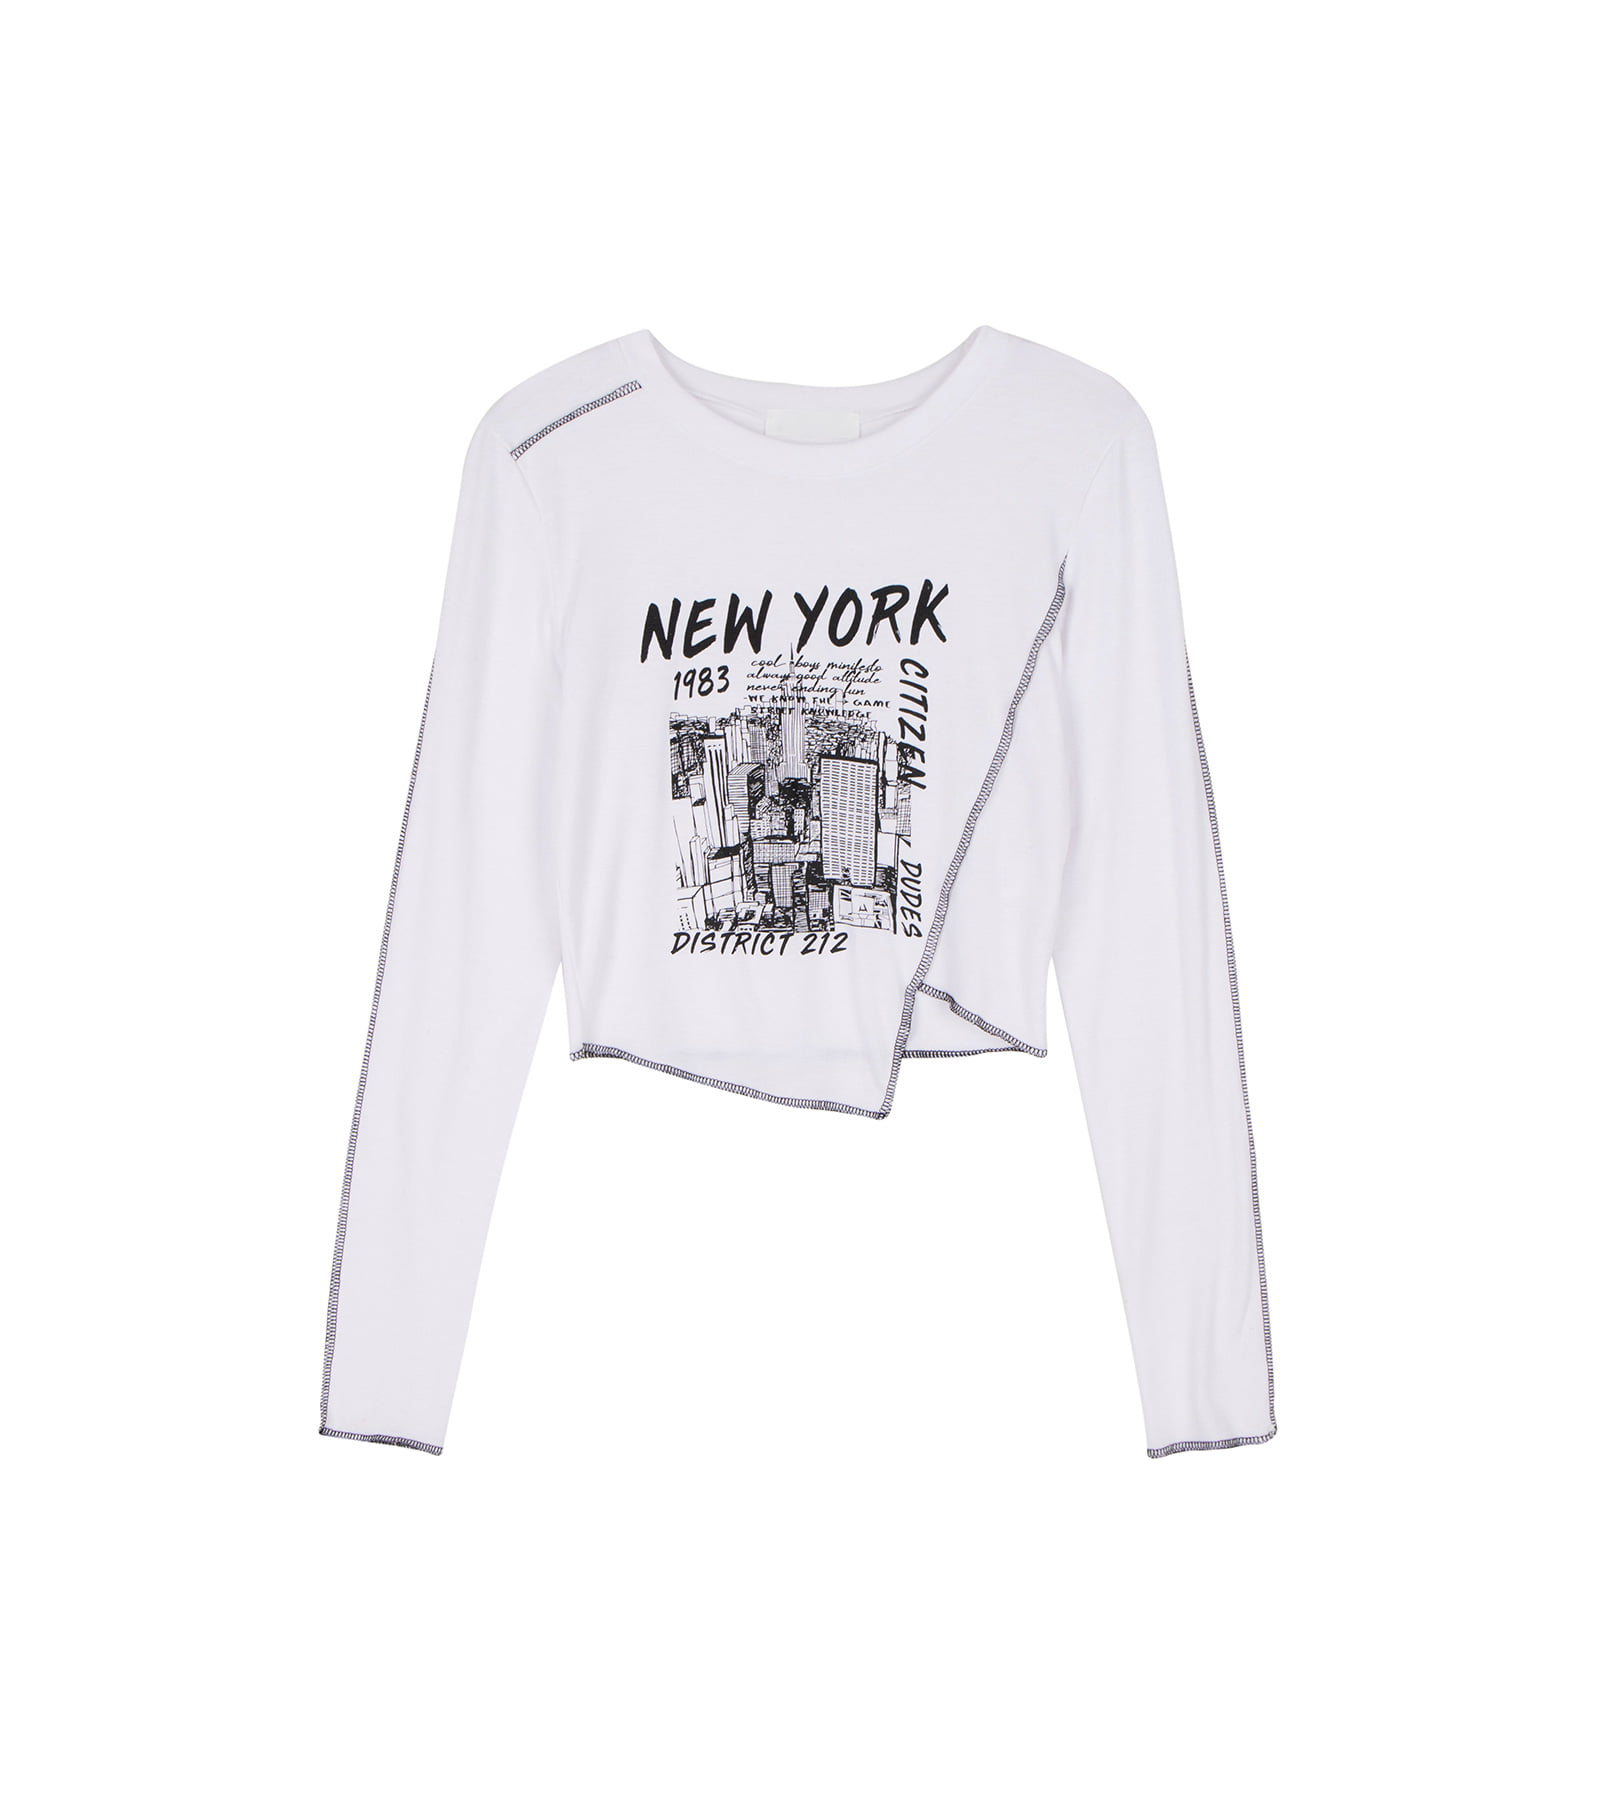 New York Unbal Long Sleeve T-shirt